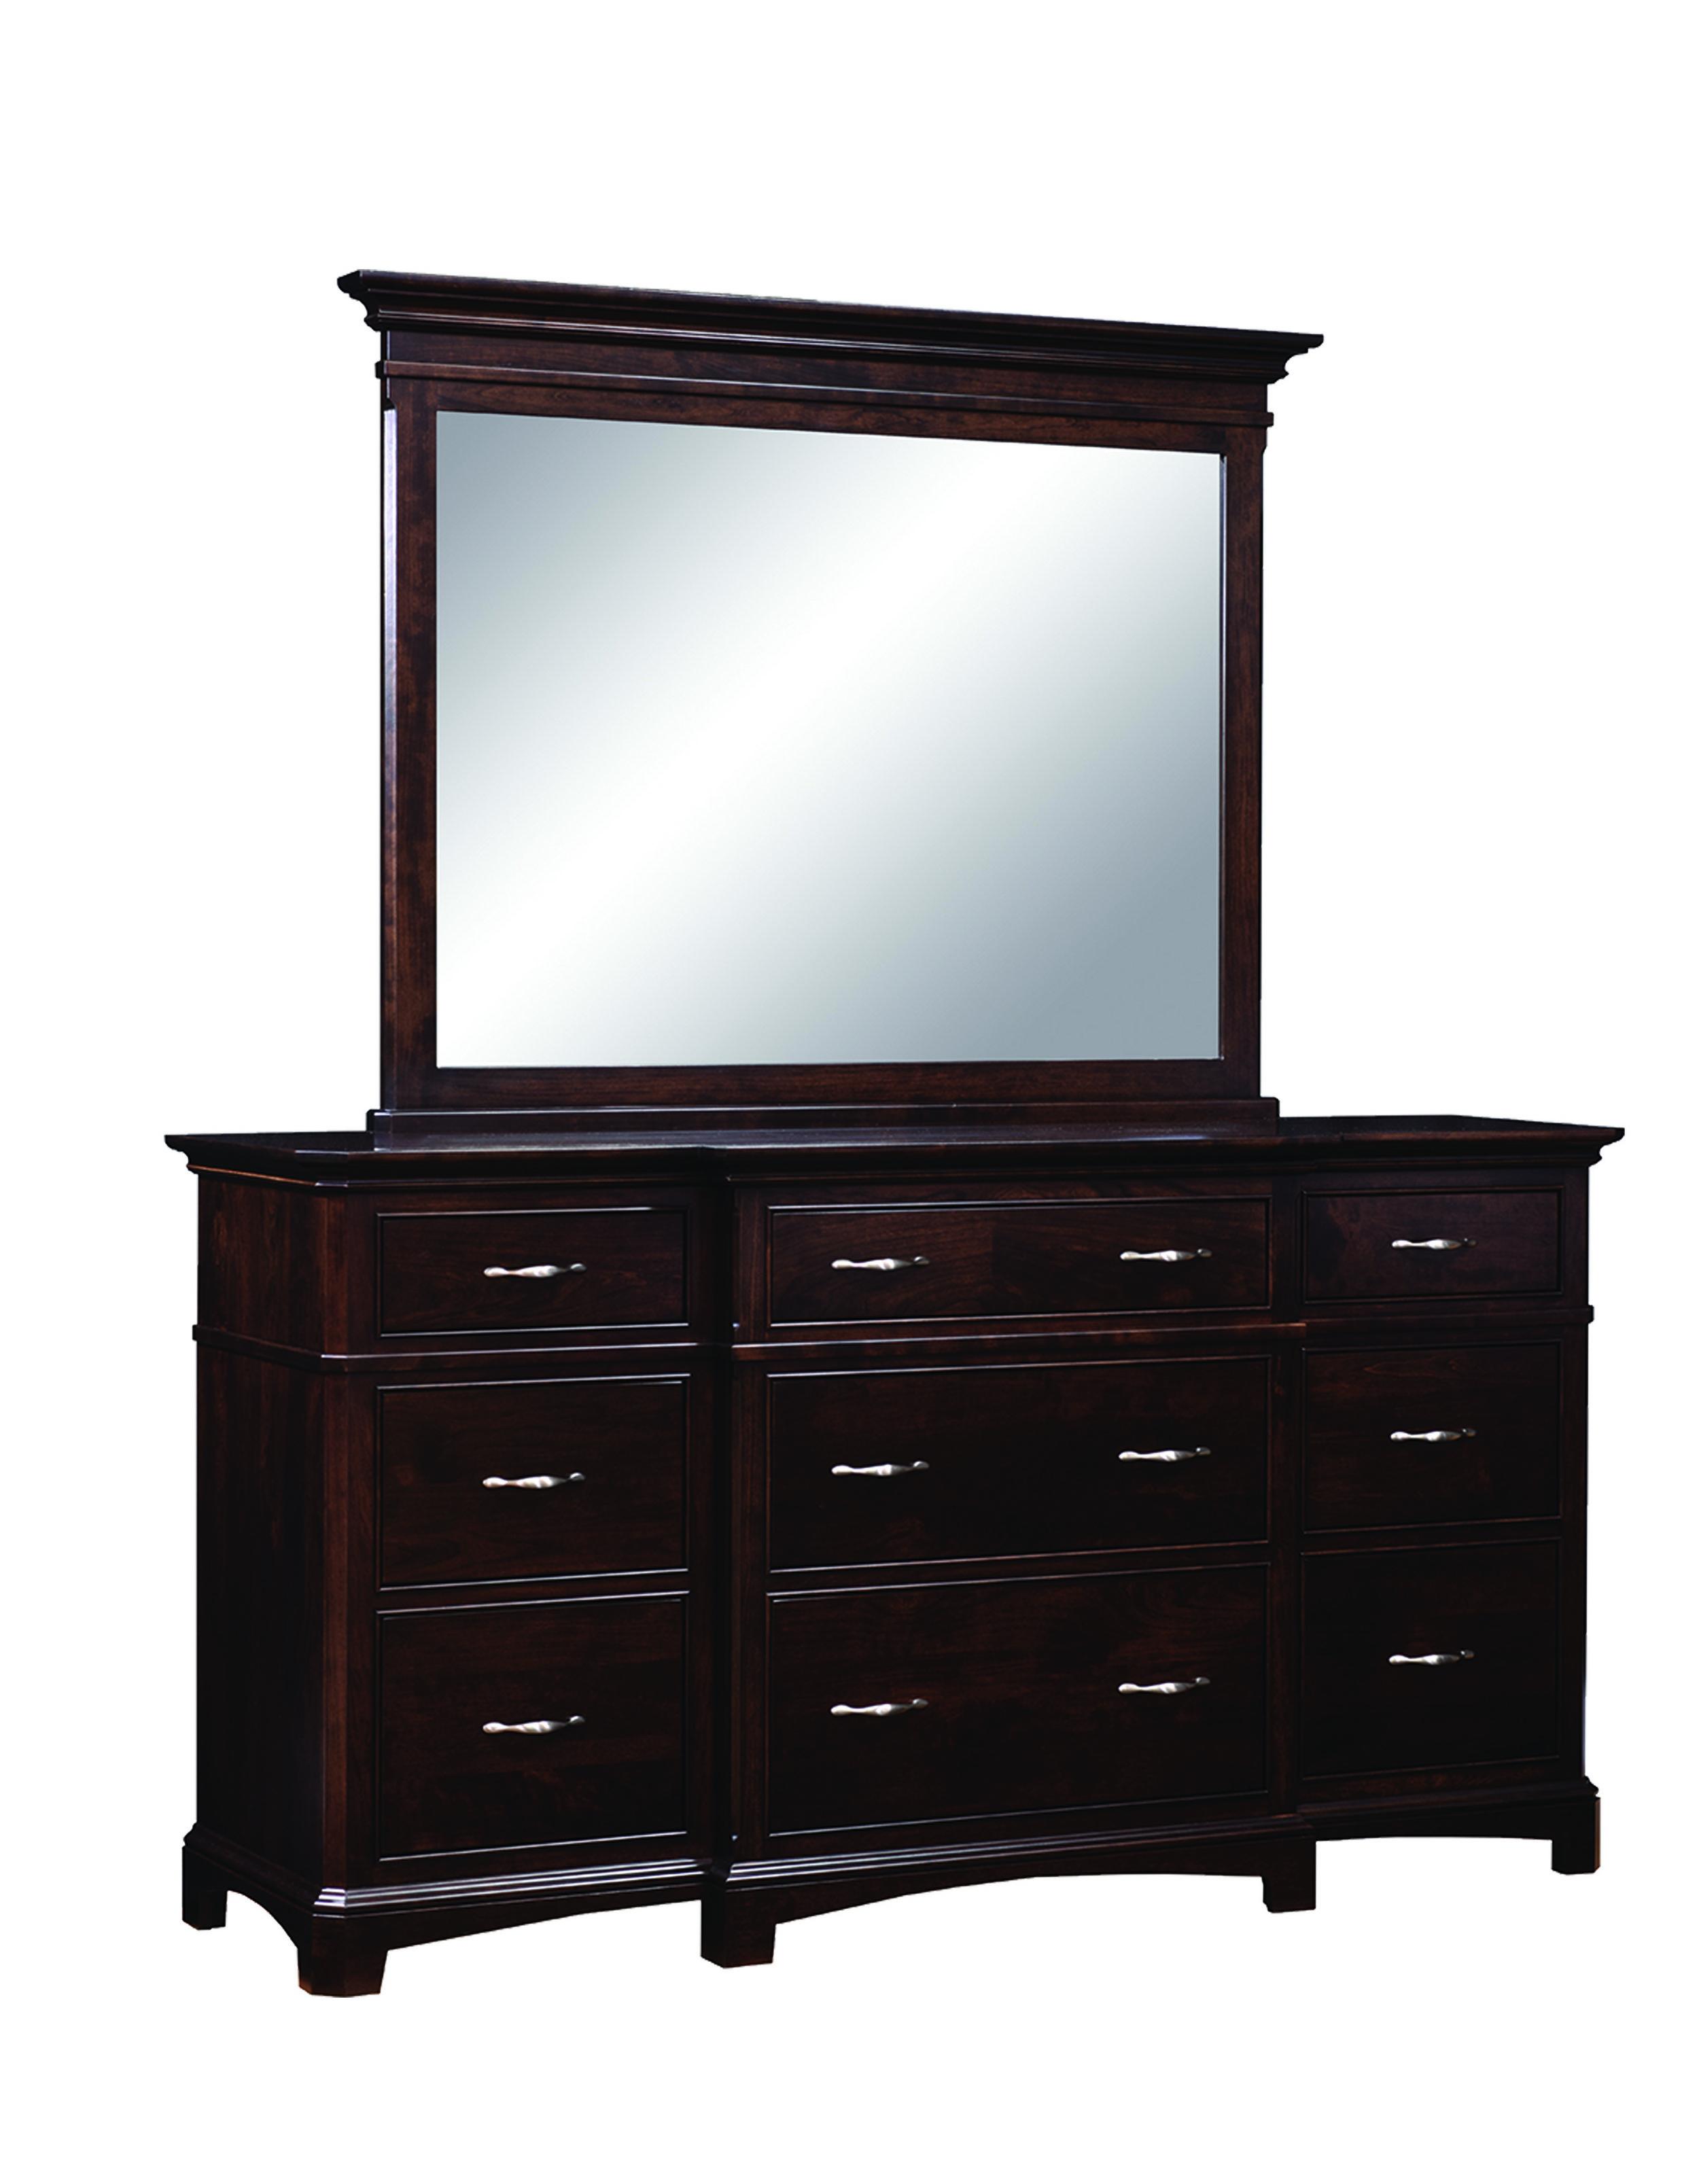 HM-1856 Dresser.jpg